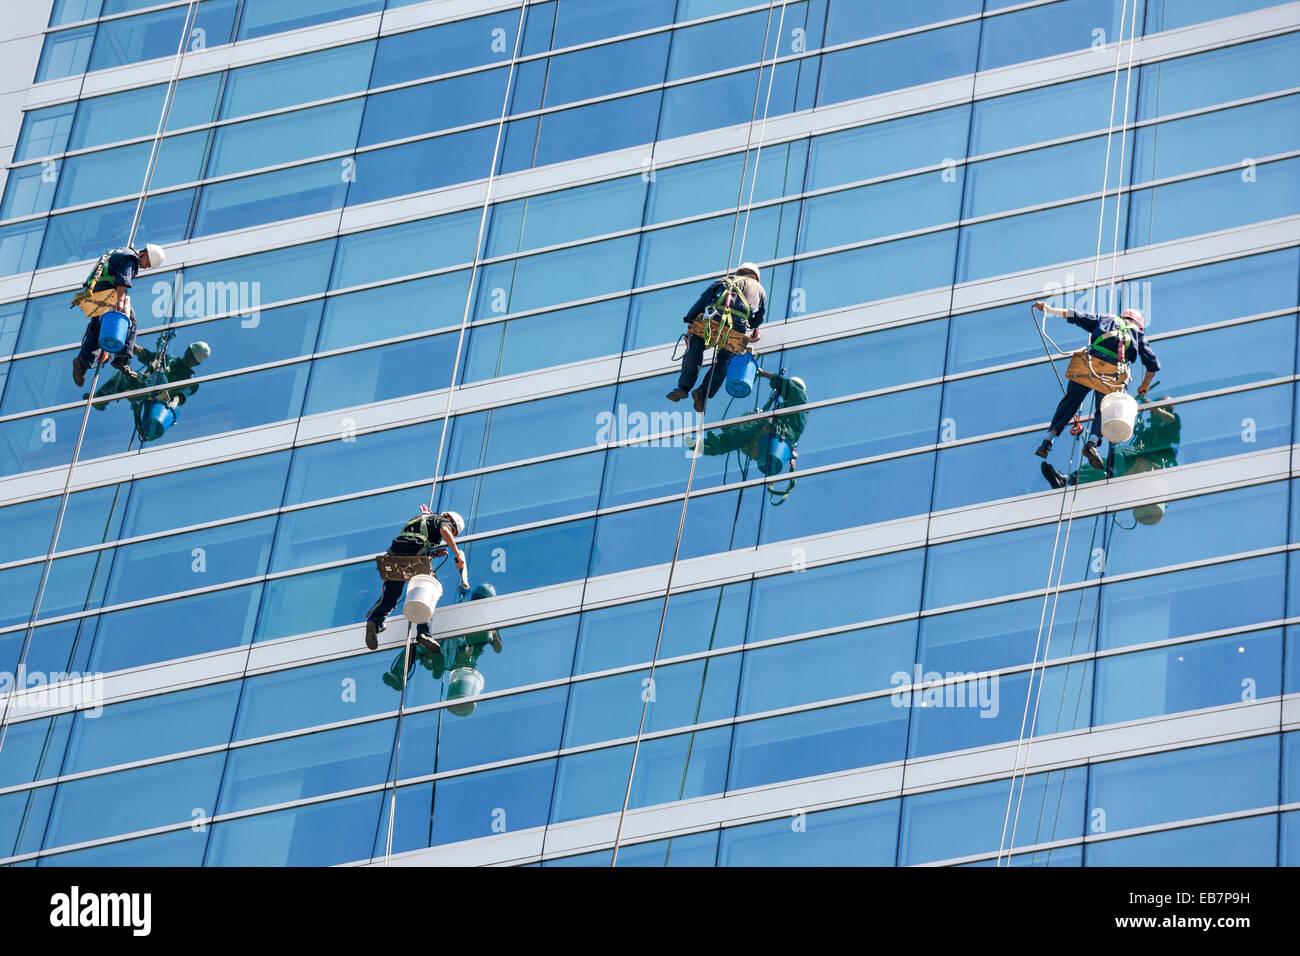 Limpieza de ventanas limpieza de ventanas de la moderna torre de oficinas edificio alto rascacielos con cuerdas Imagen De Stock